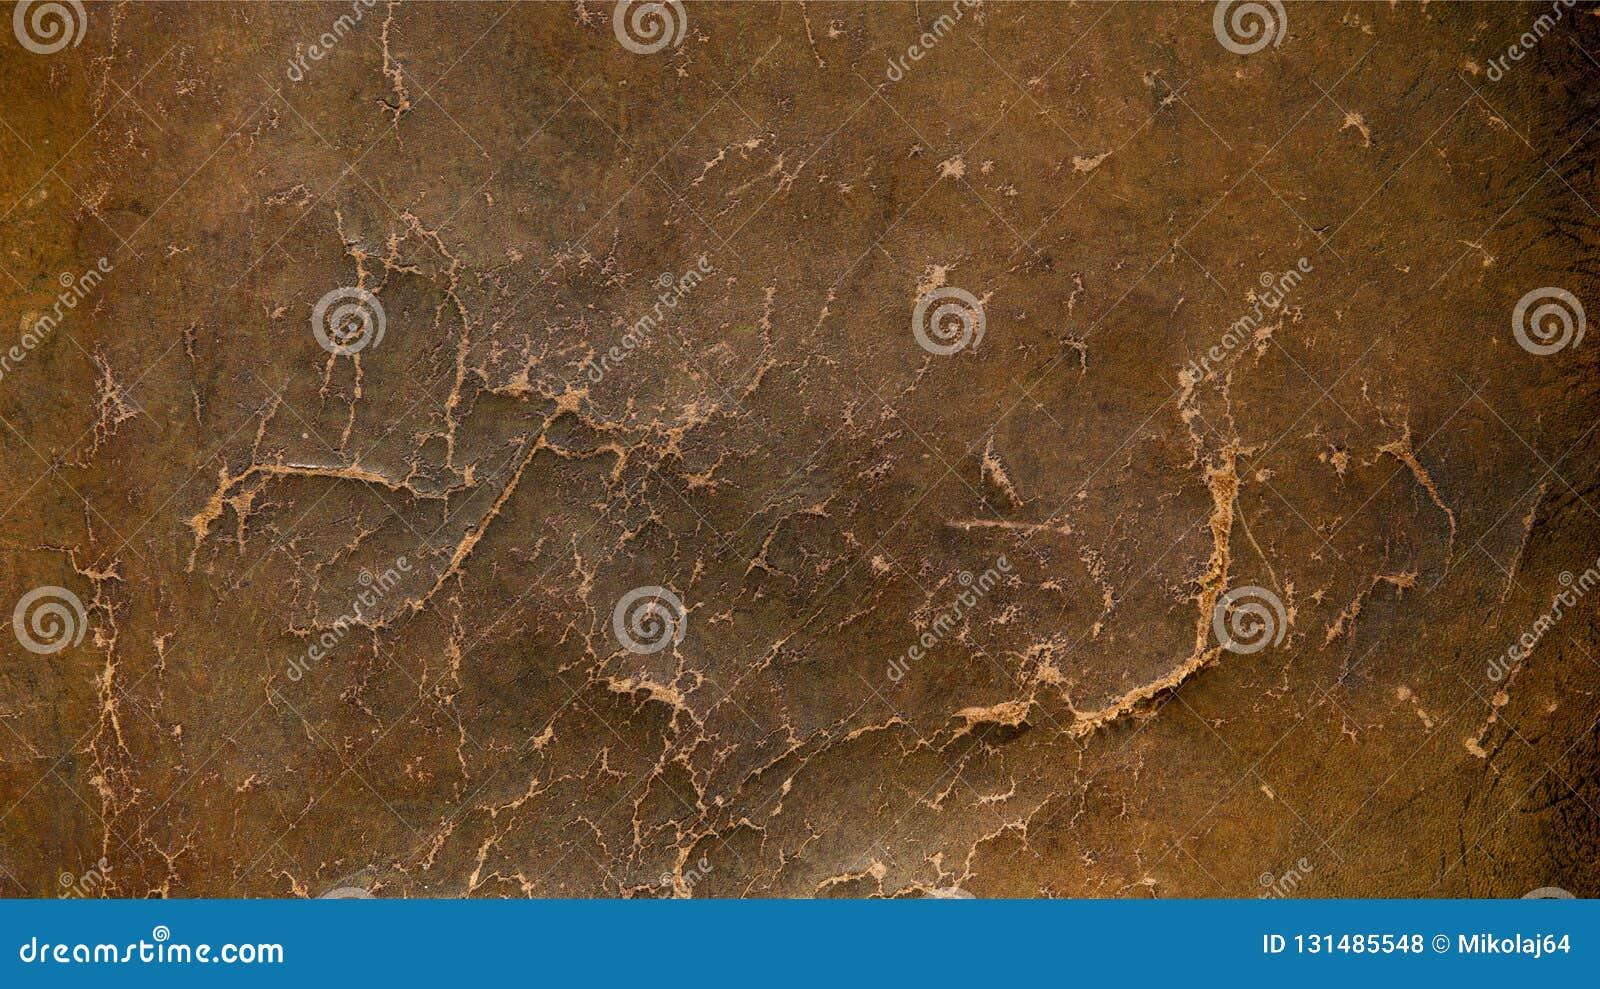 Brown Vintage Leather Texture - PhotoHDX